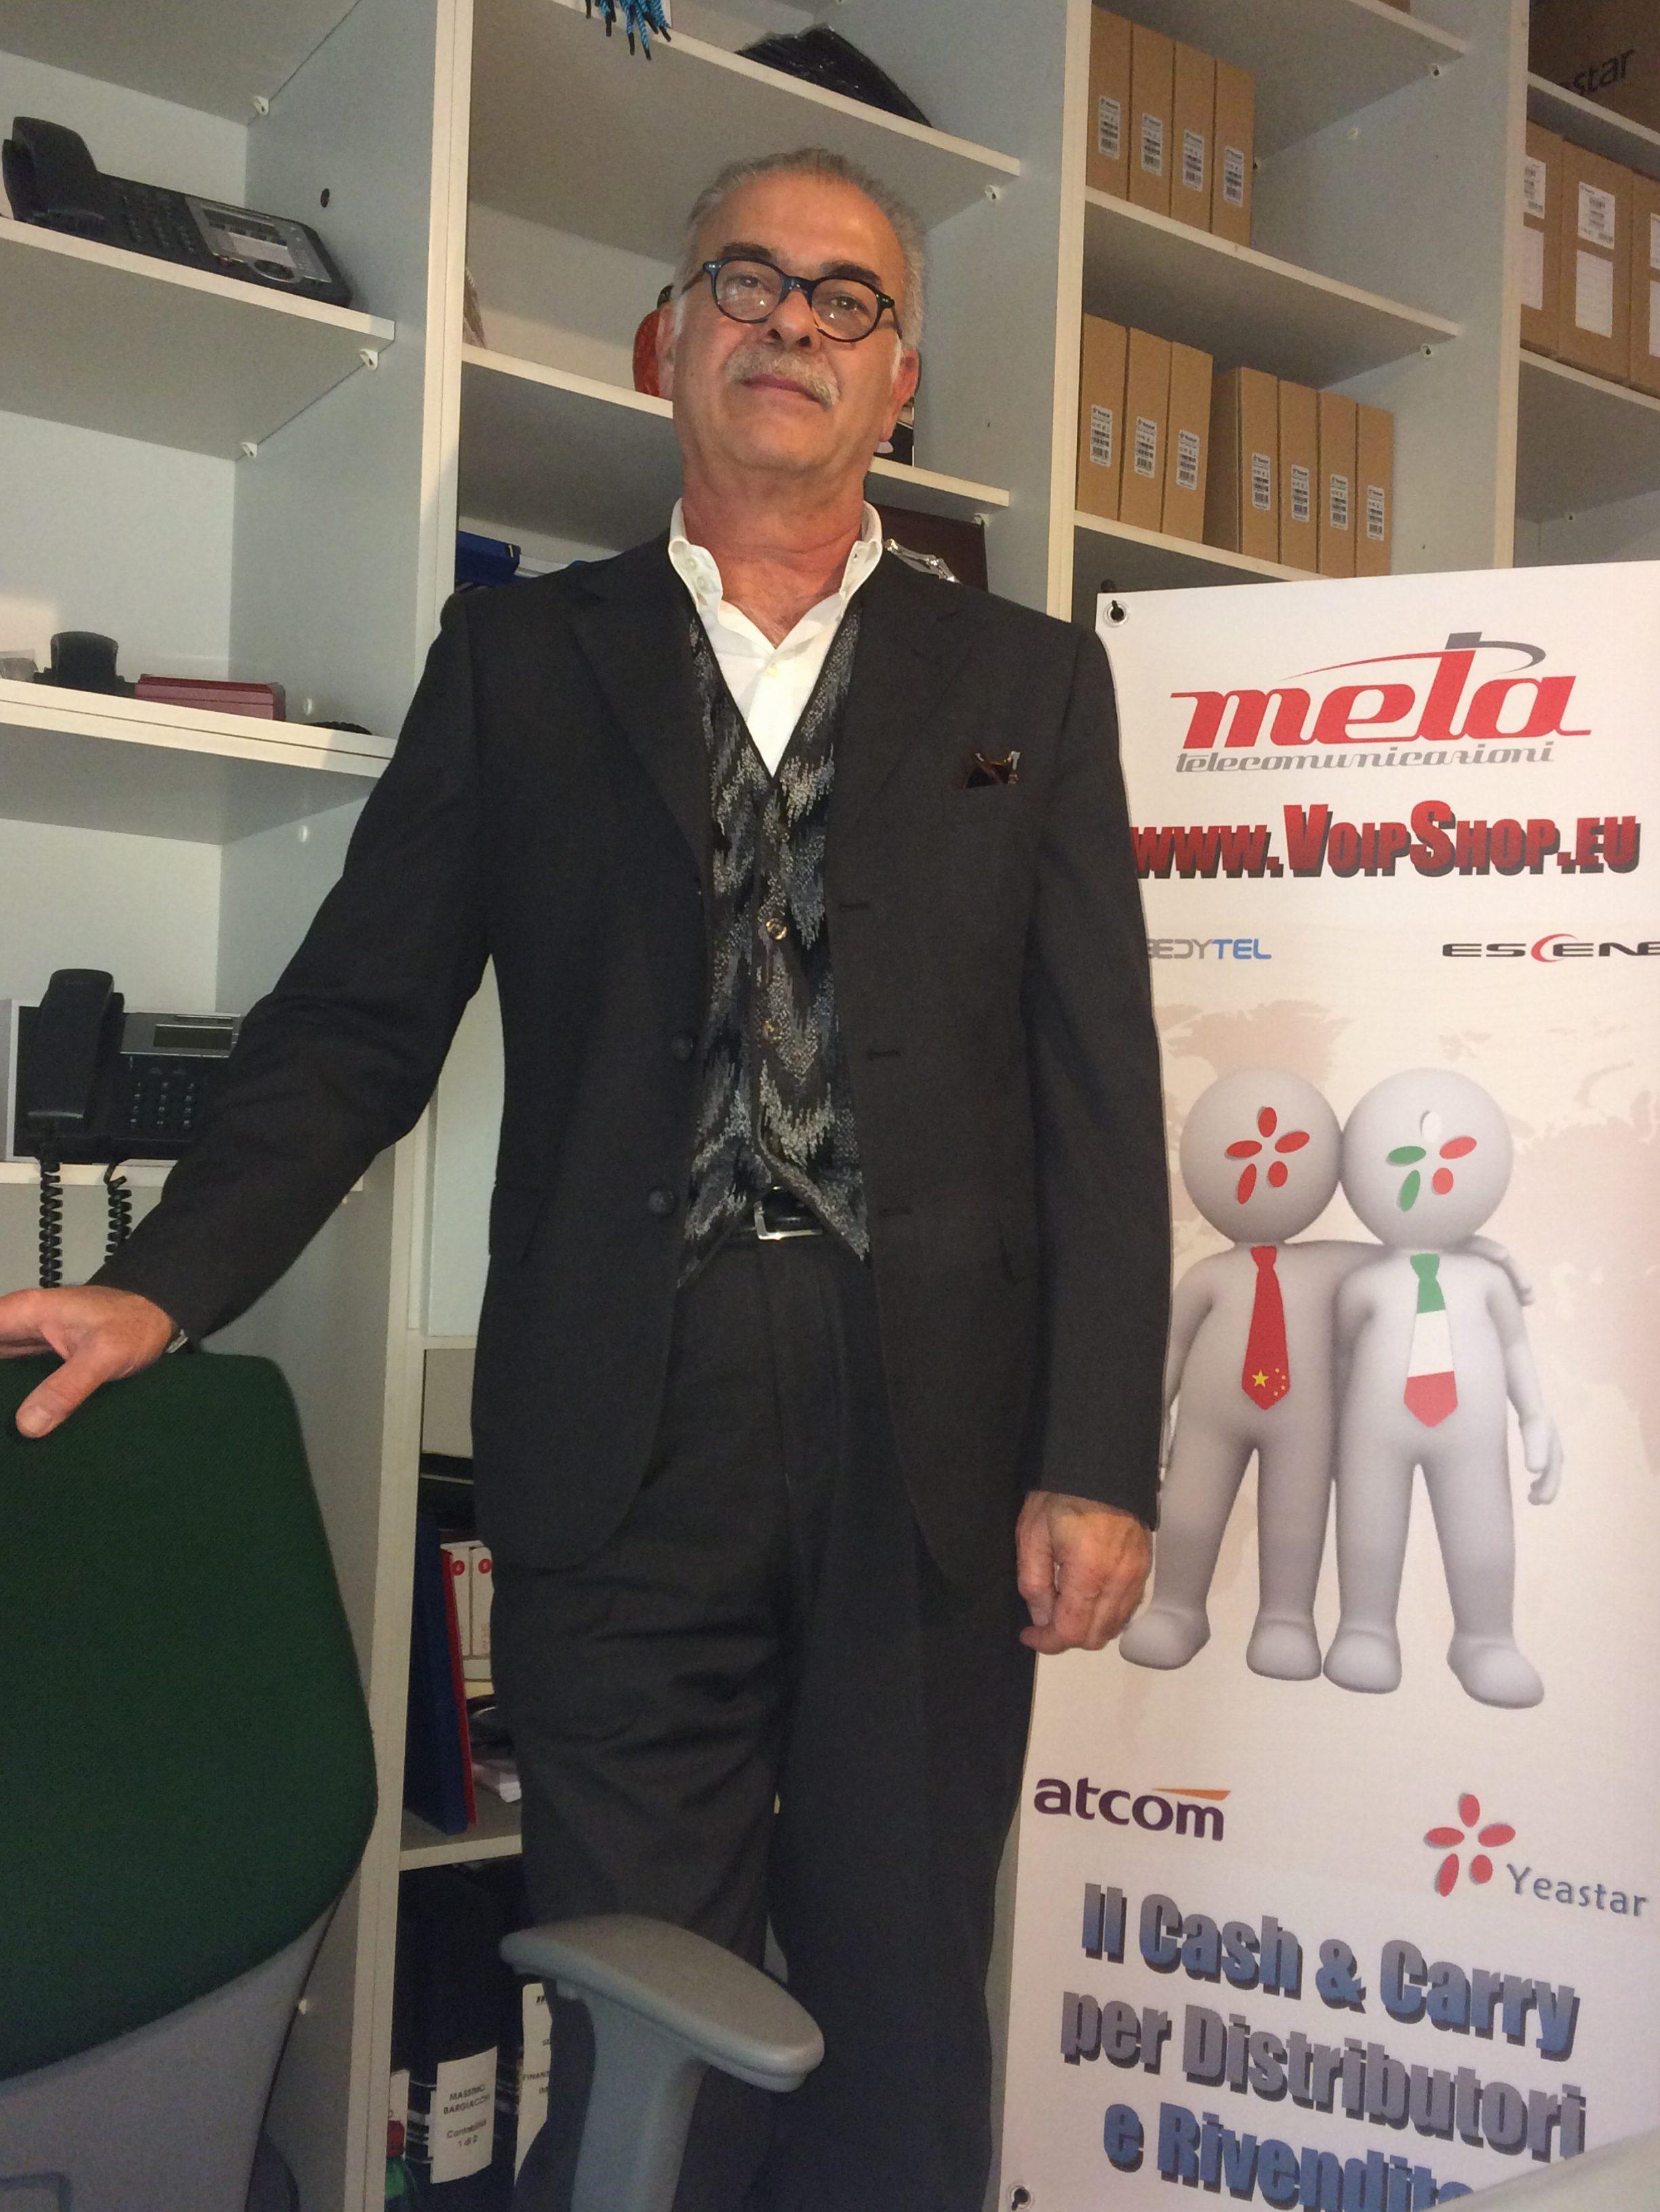 Intervista a Massimo Bargiacchi, CEO Meta System